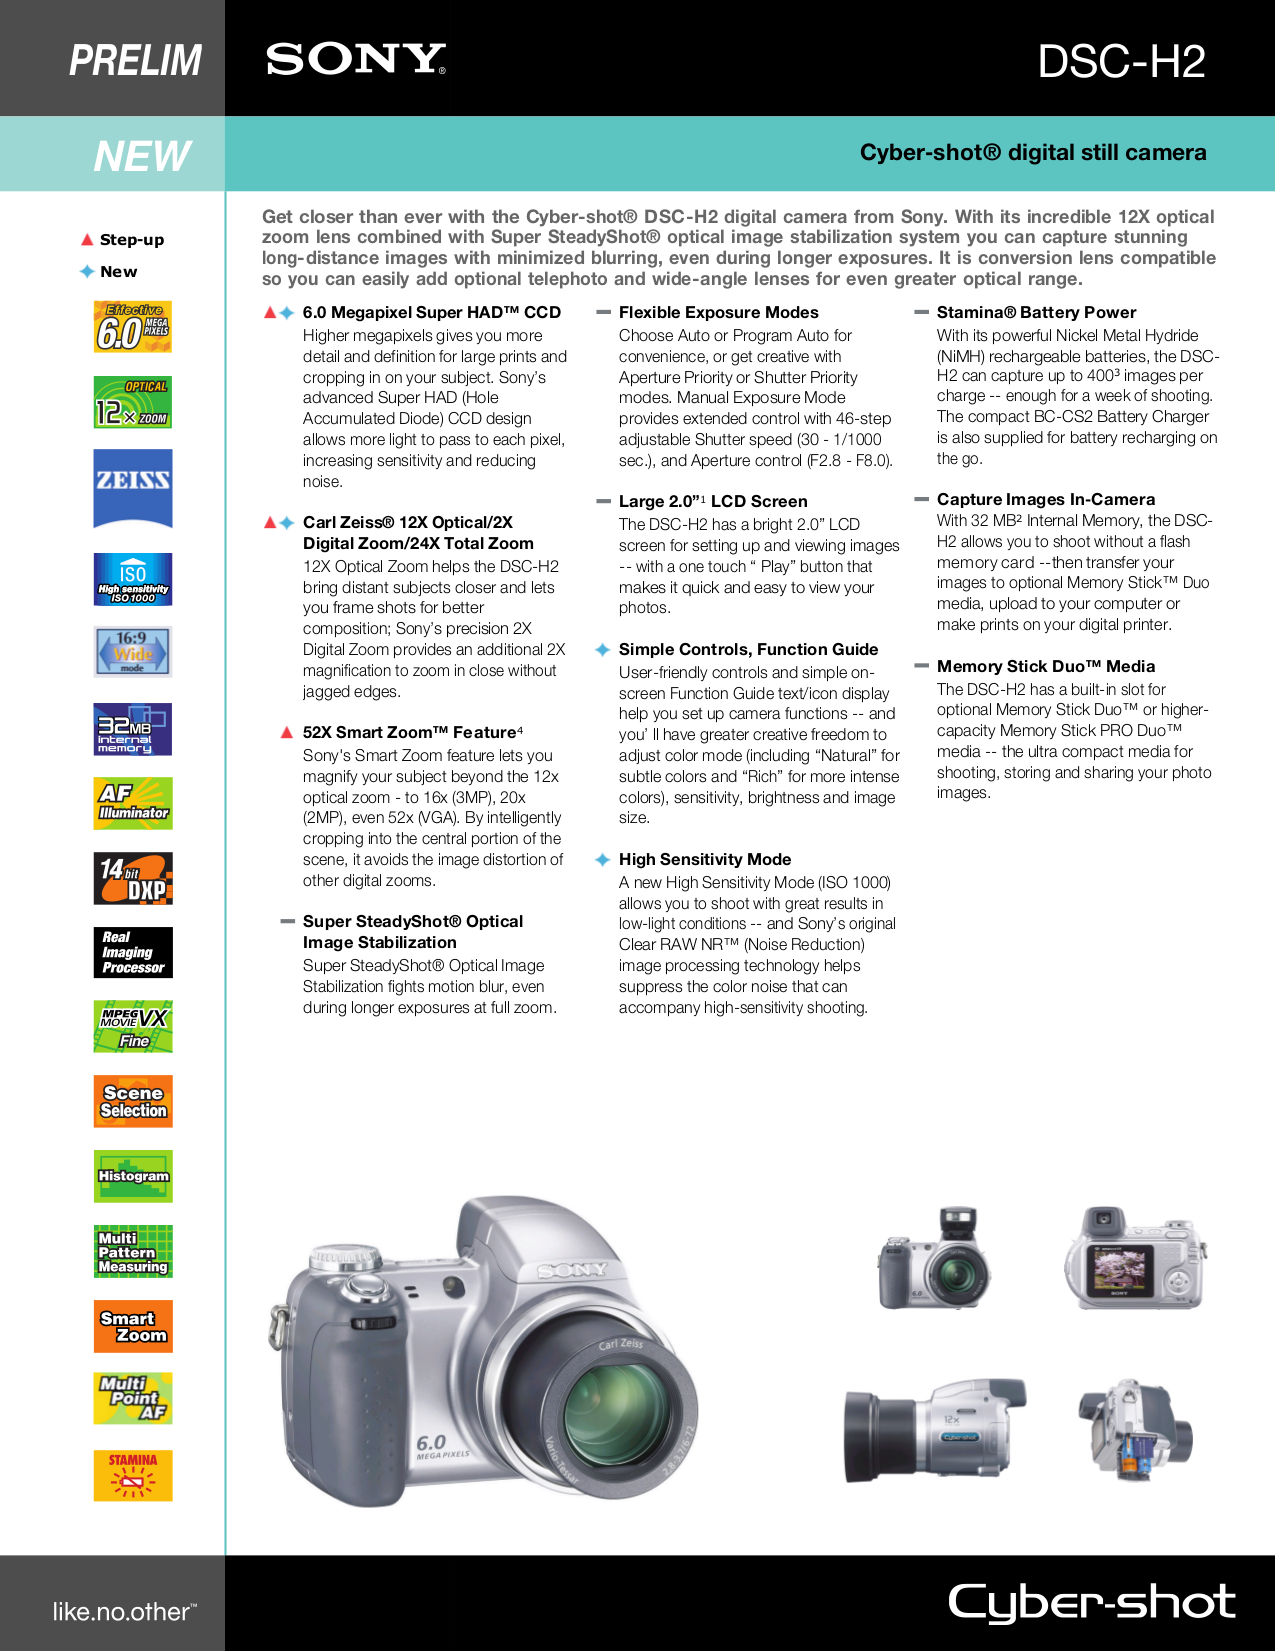 pdf for Sony Digital Camera Cybershot,Cyber-shot DSC-H2 manual